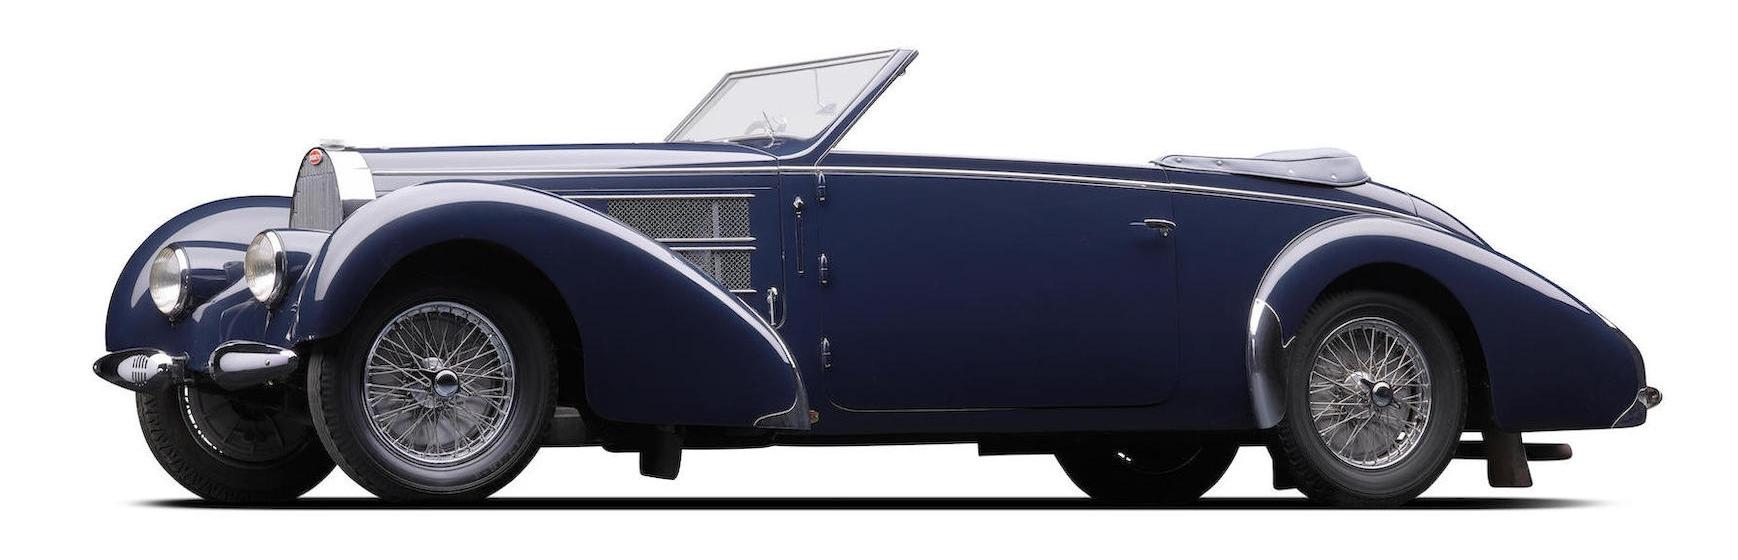 1938 Bugatti Type 57C Convertible-10